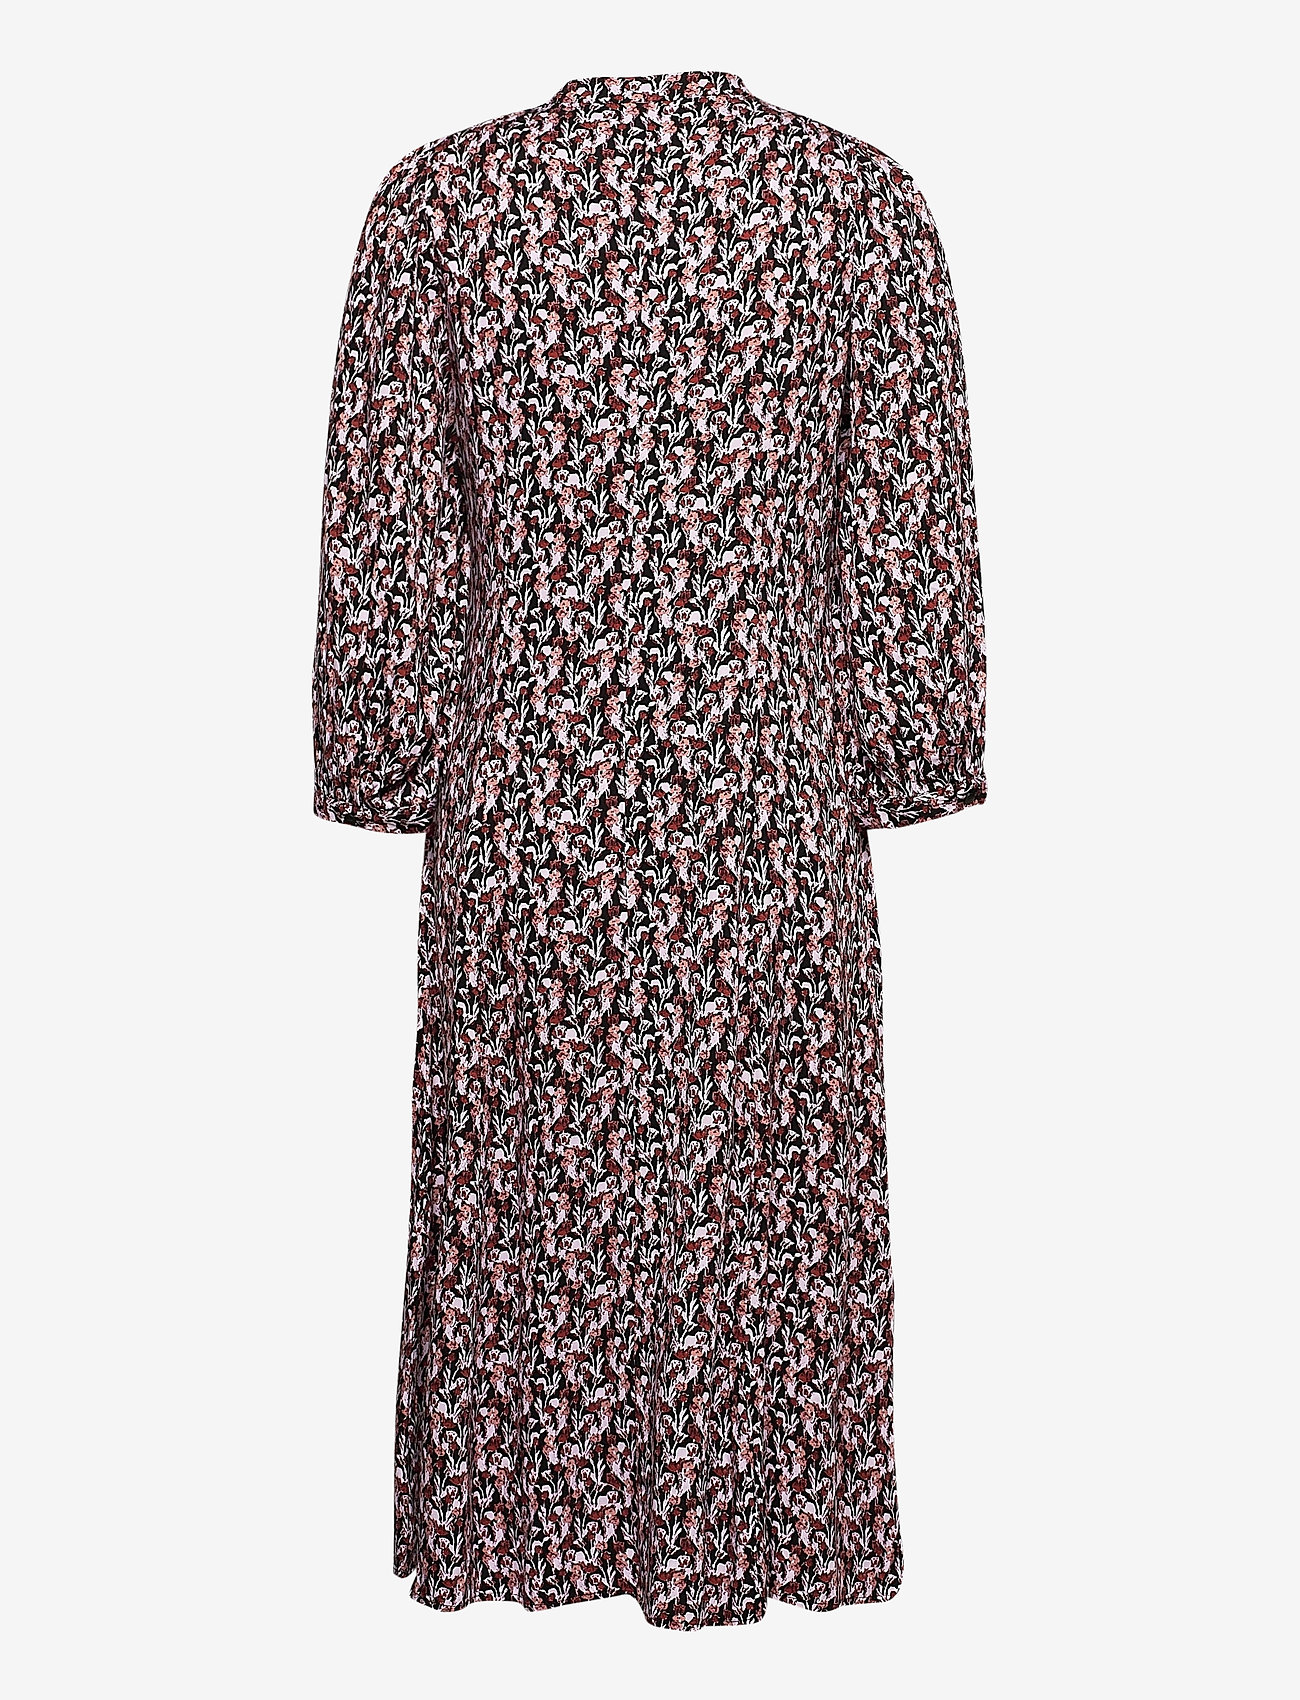 MOSS COPENHAGEN - Karola Raye 3/4 Dress AOP - alledaagse jurken - blk lavender fl - 1